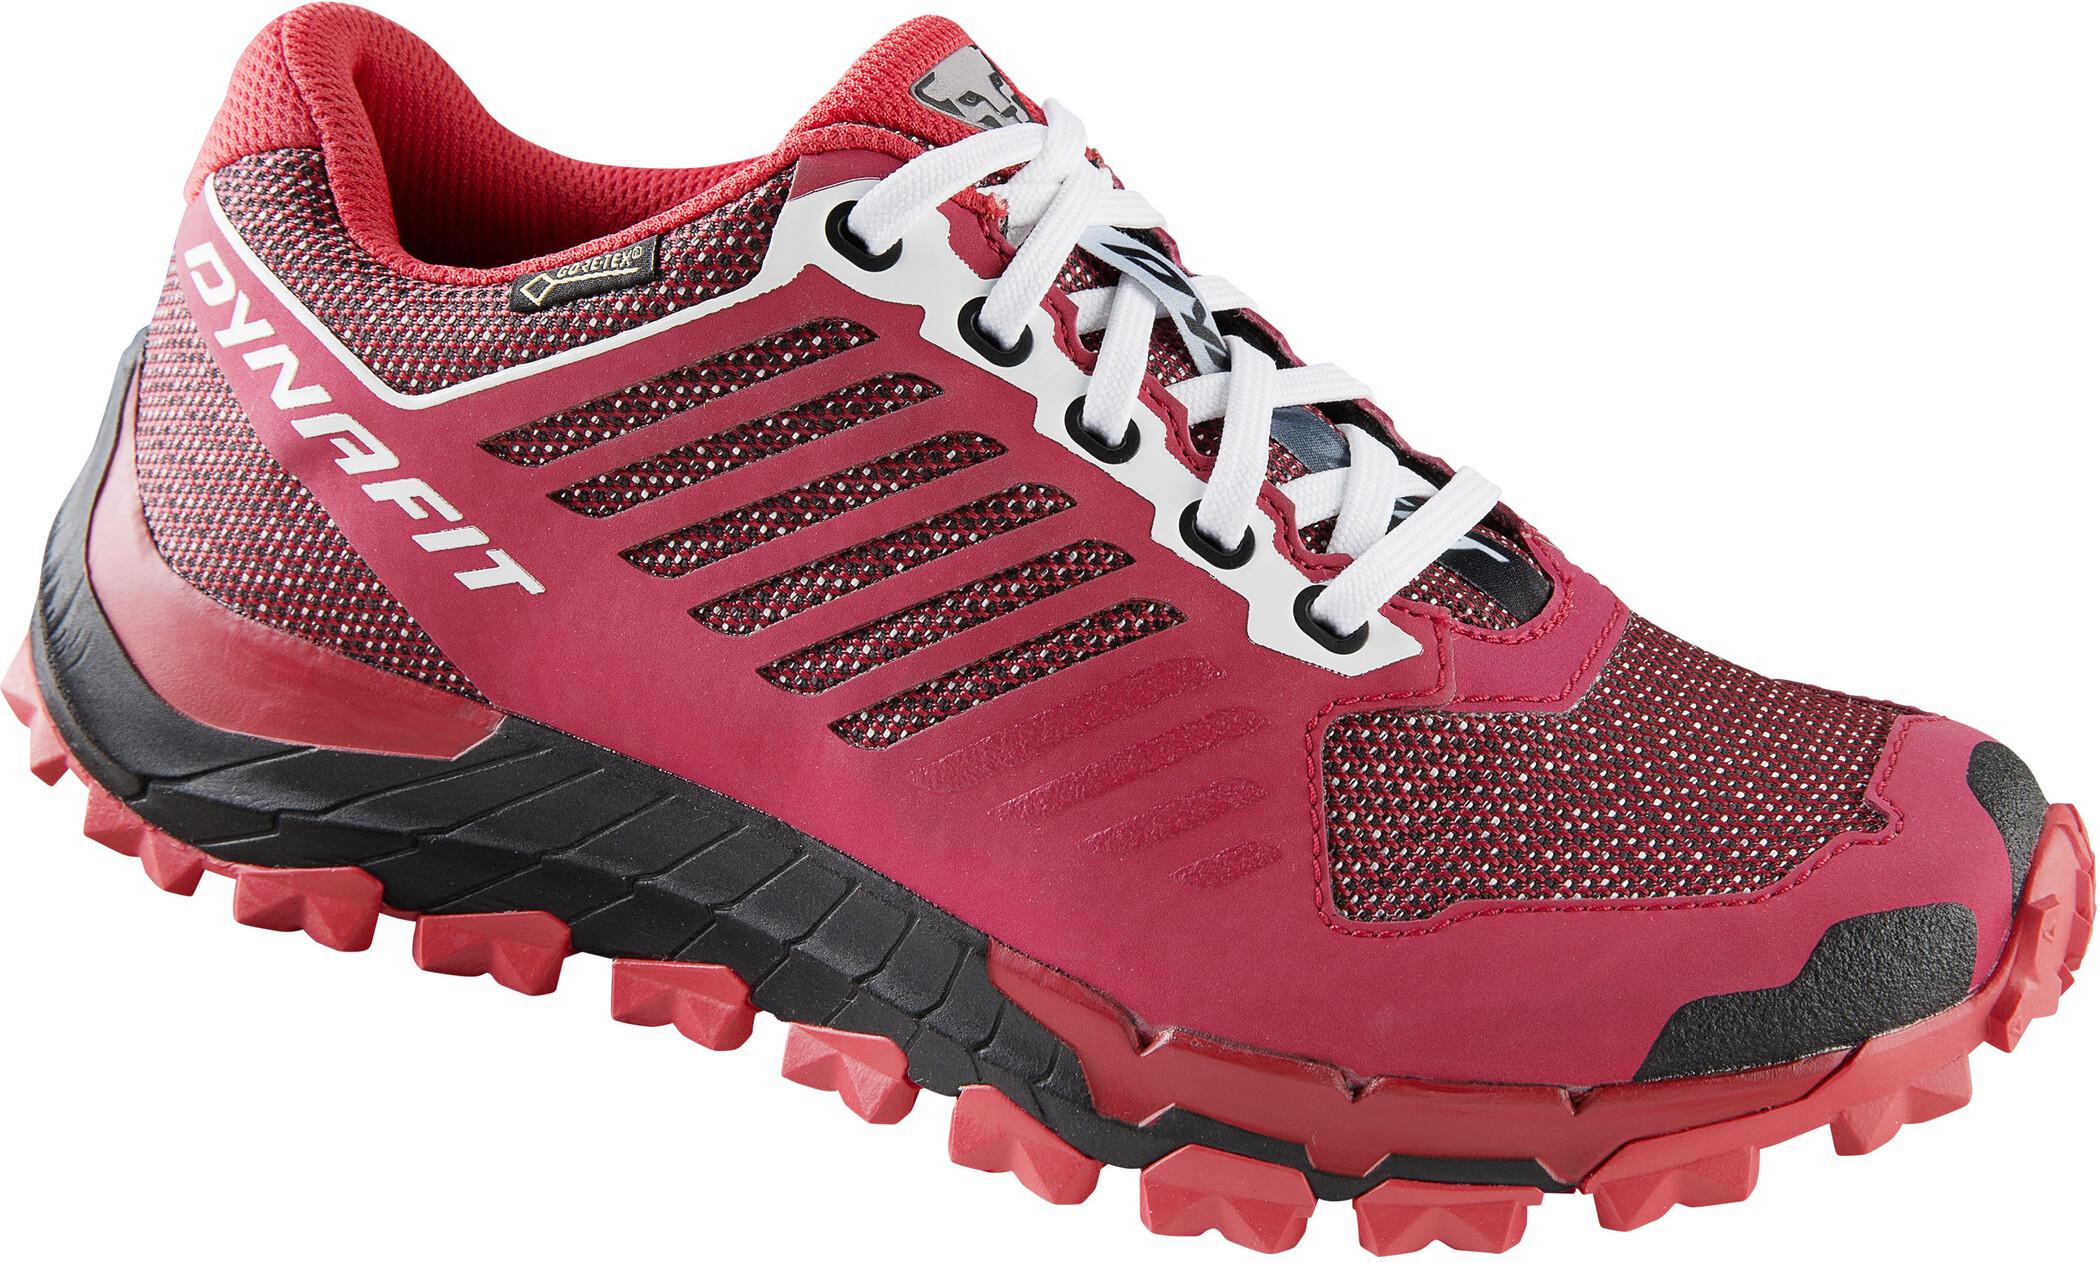 Dynafit Trailbreaker Gore-Tex Løbesko Damer, crimson/asphalt (2019) | Running shoes